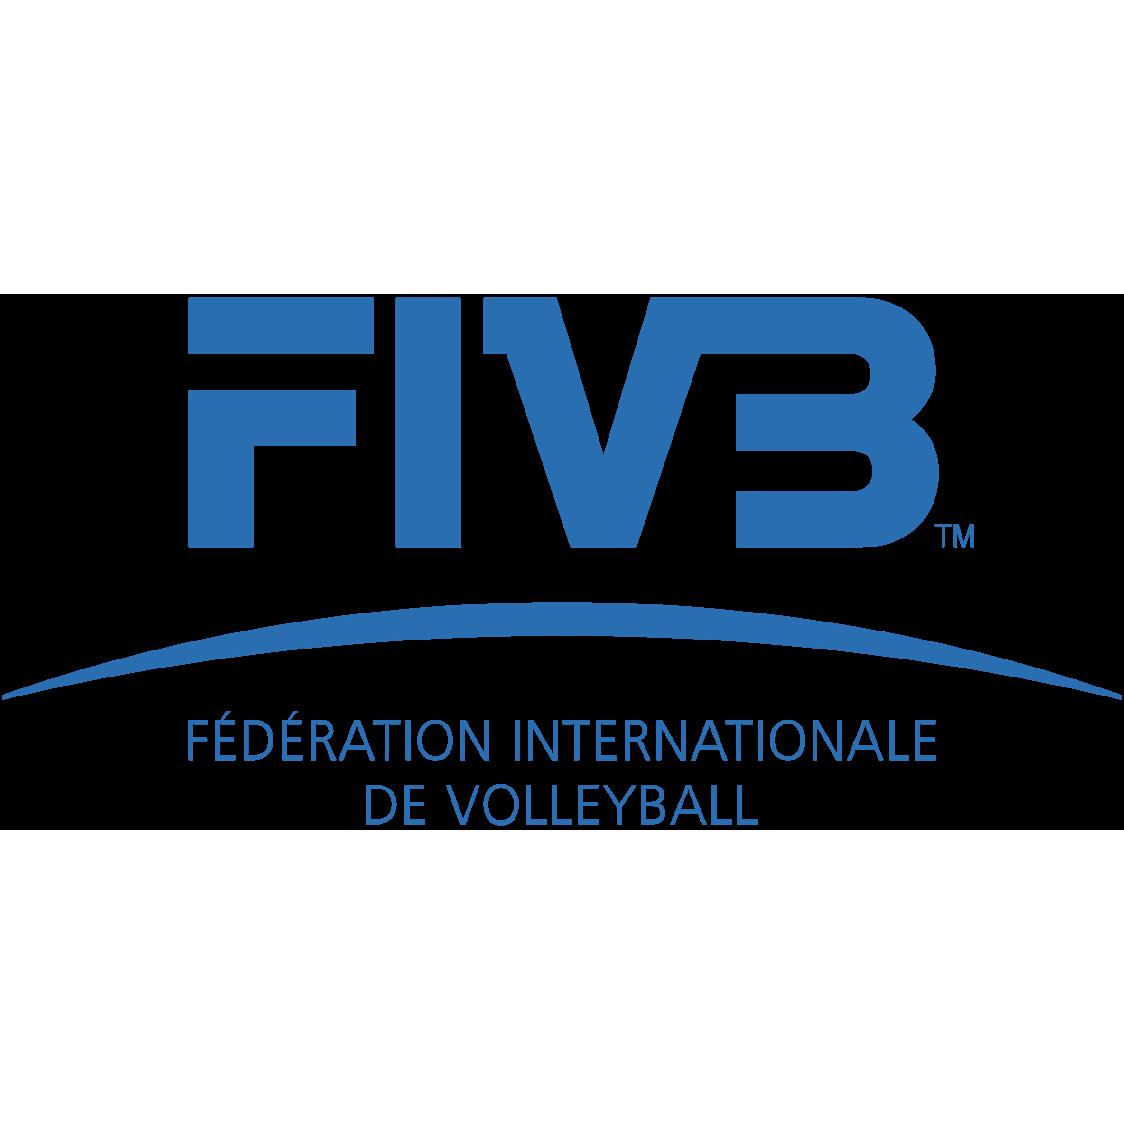 2014 U19 Beach Volleyball World Championships